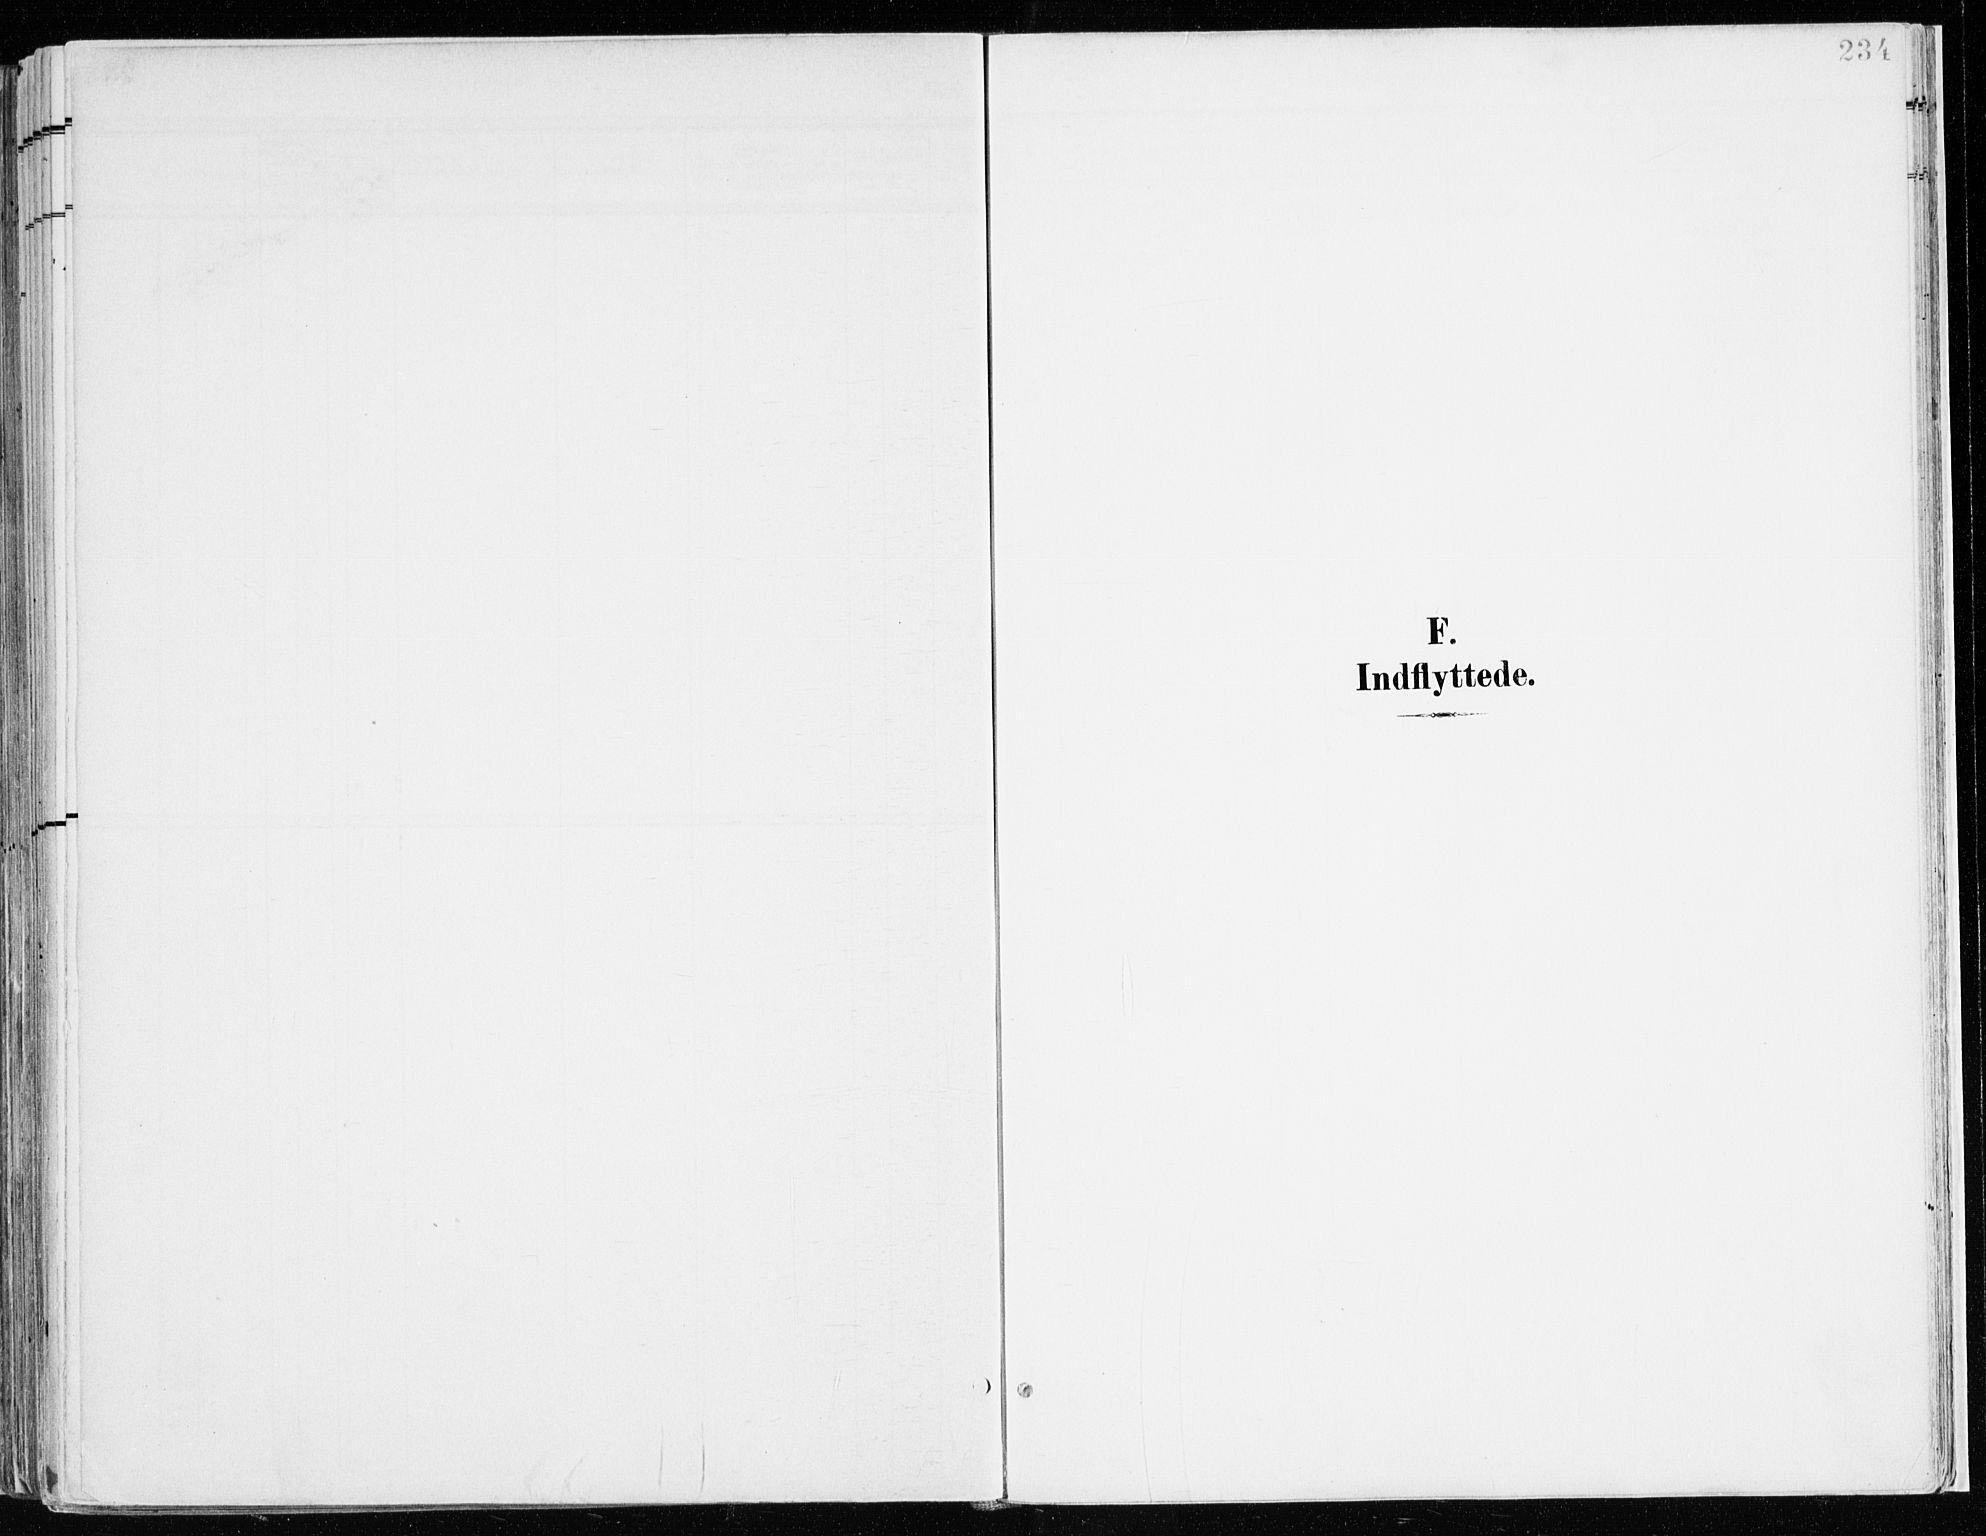 SAH, Nord-Odal prestekontor, Ministerialbok nr. 9, 1902-1926, s. 234